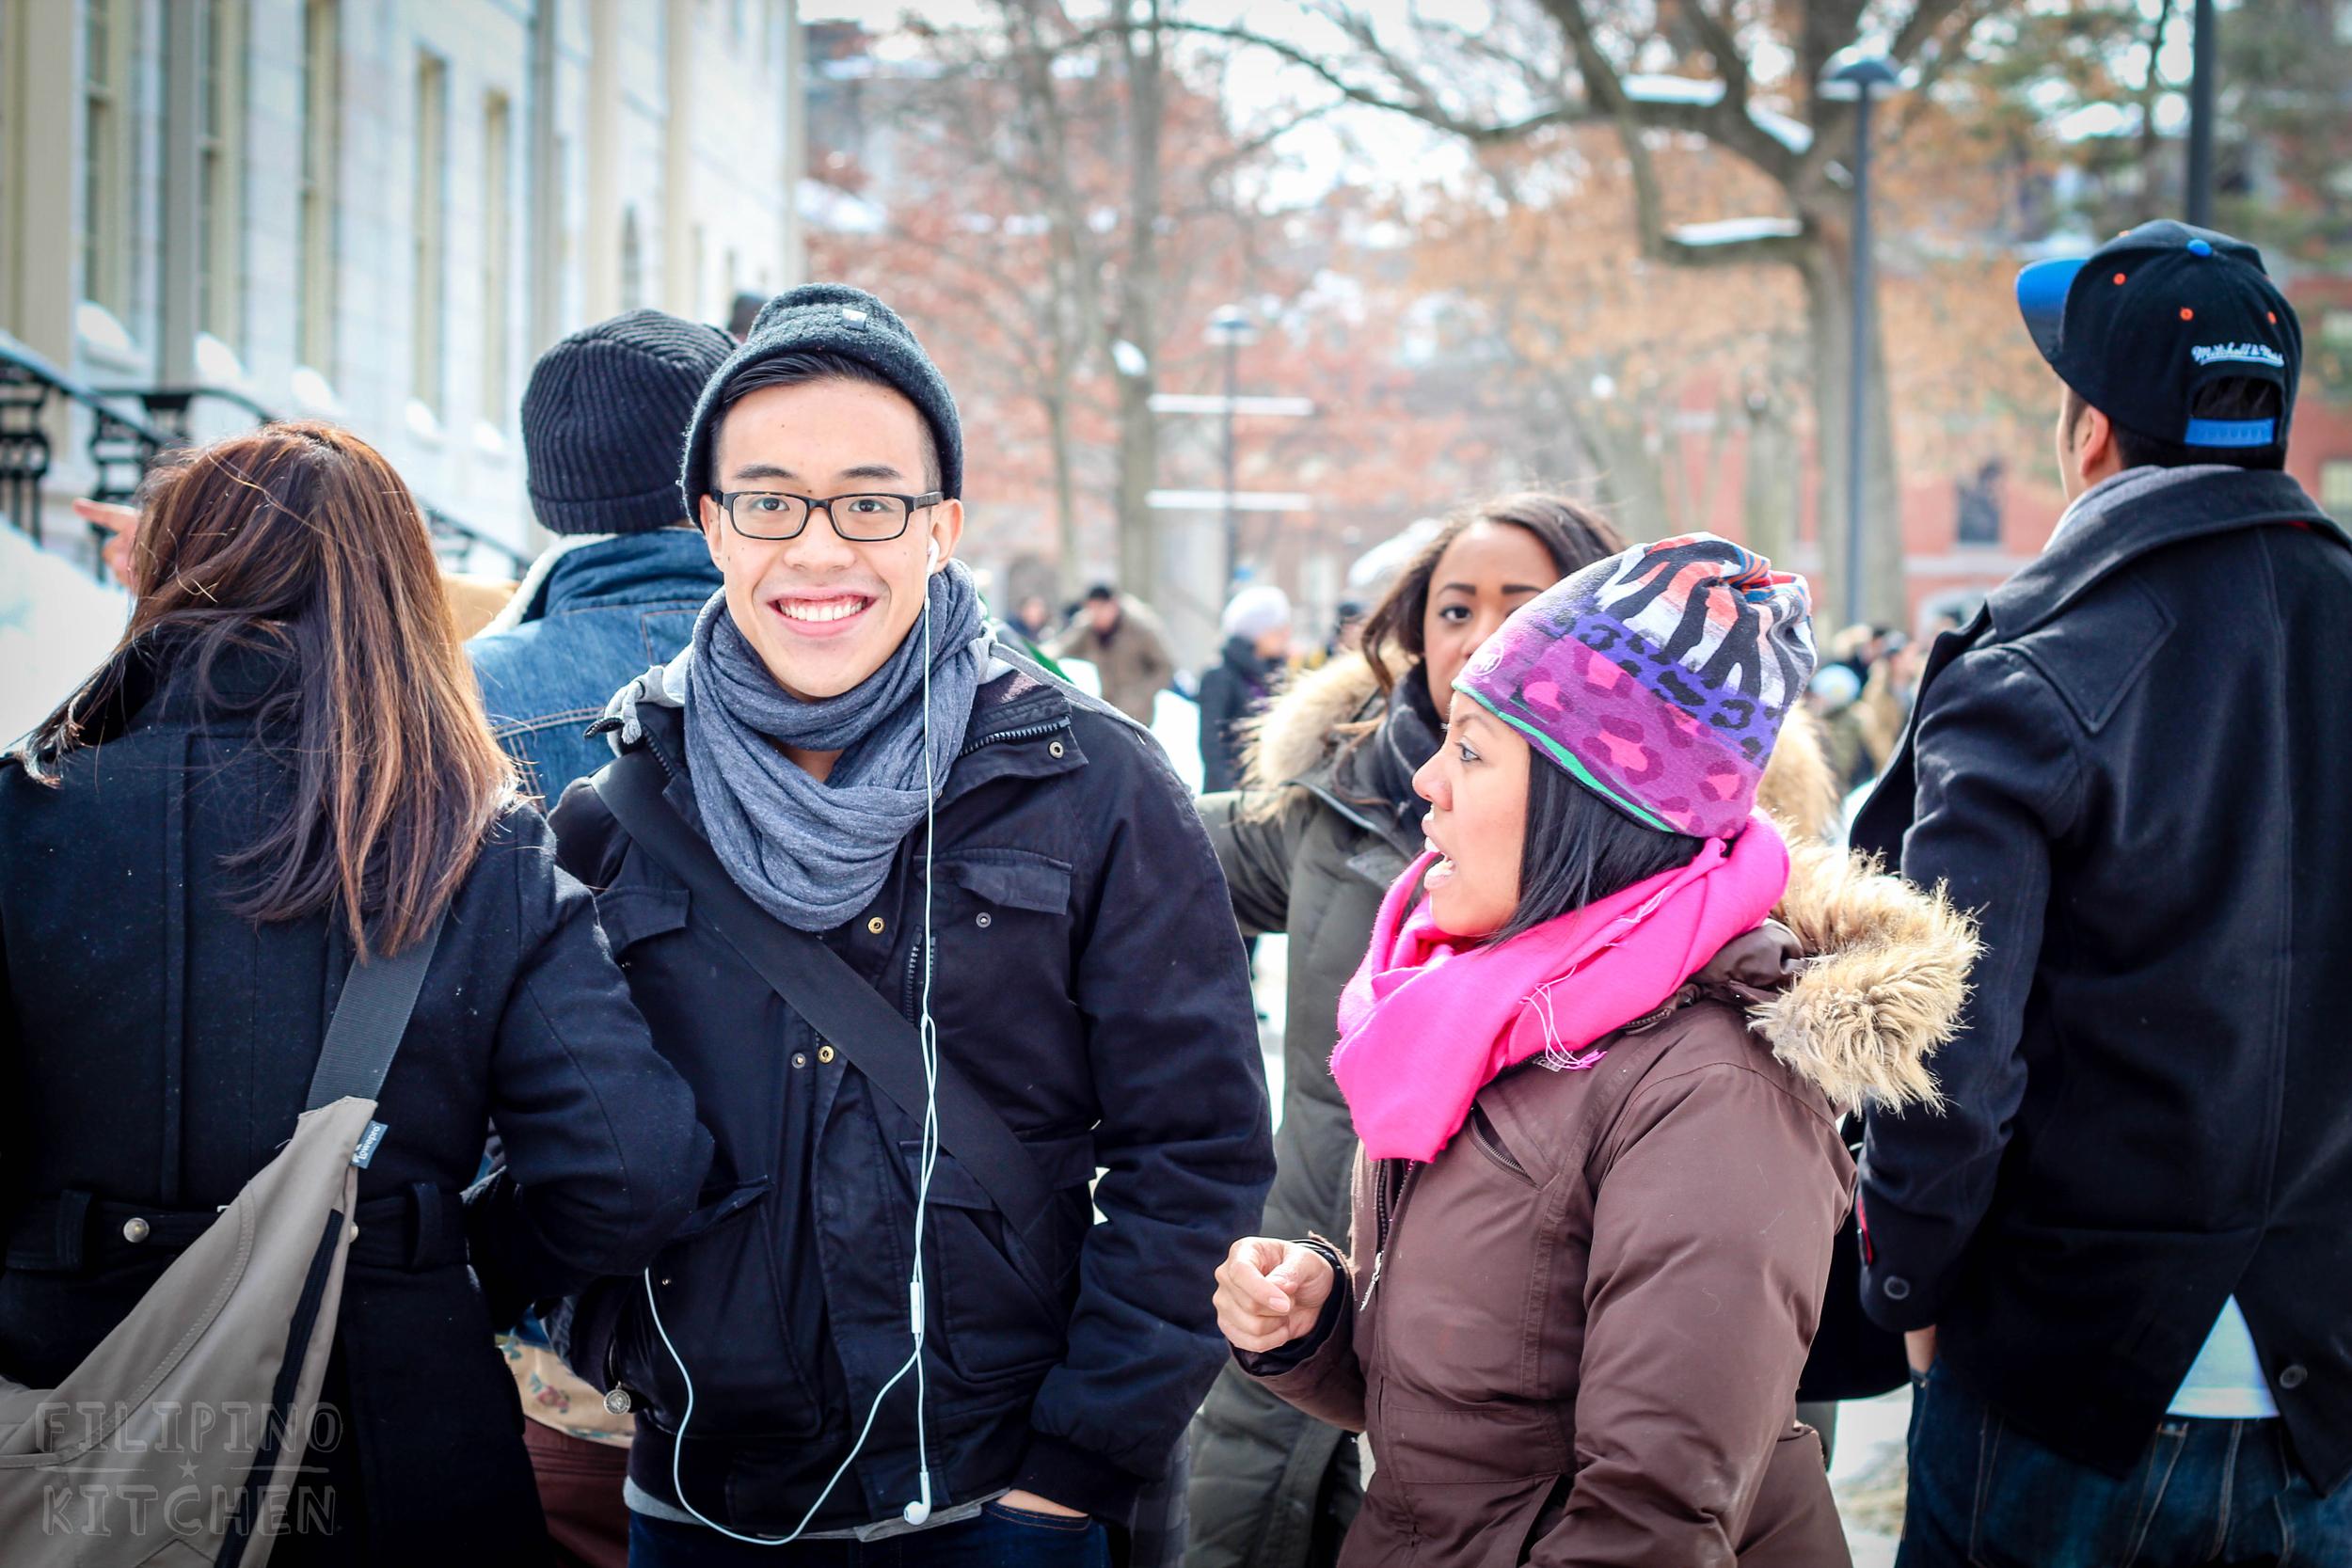 FKEDUP crew getting lost in Harvard.